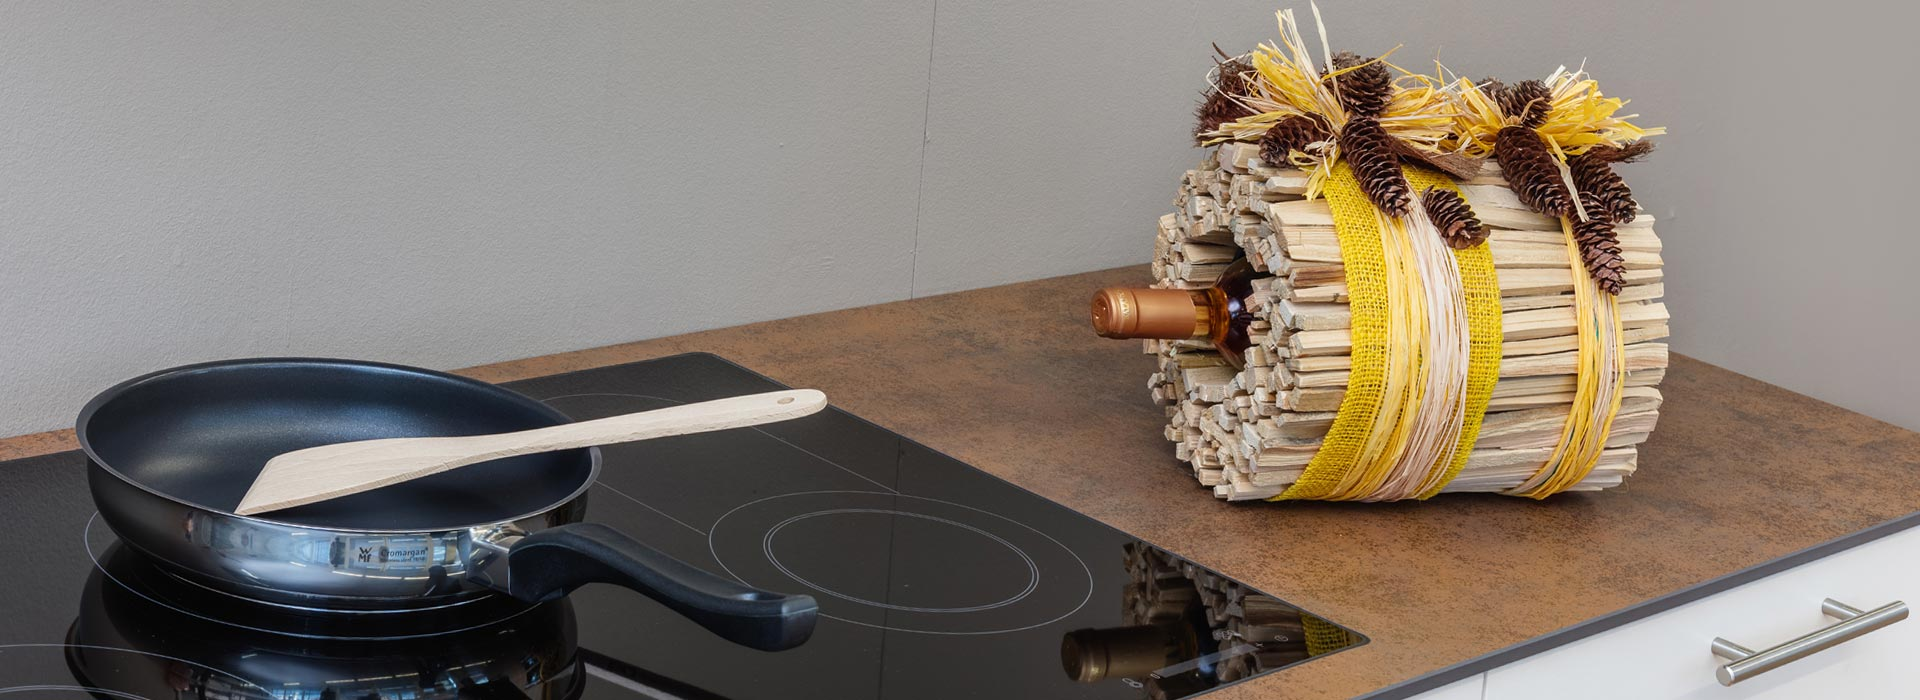 grosses Kochfeld mit Keramikabdeckung